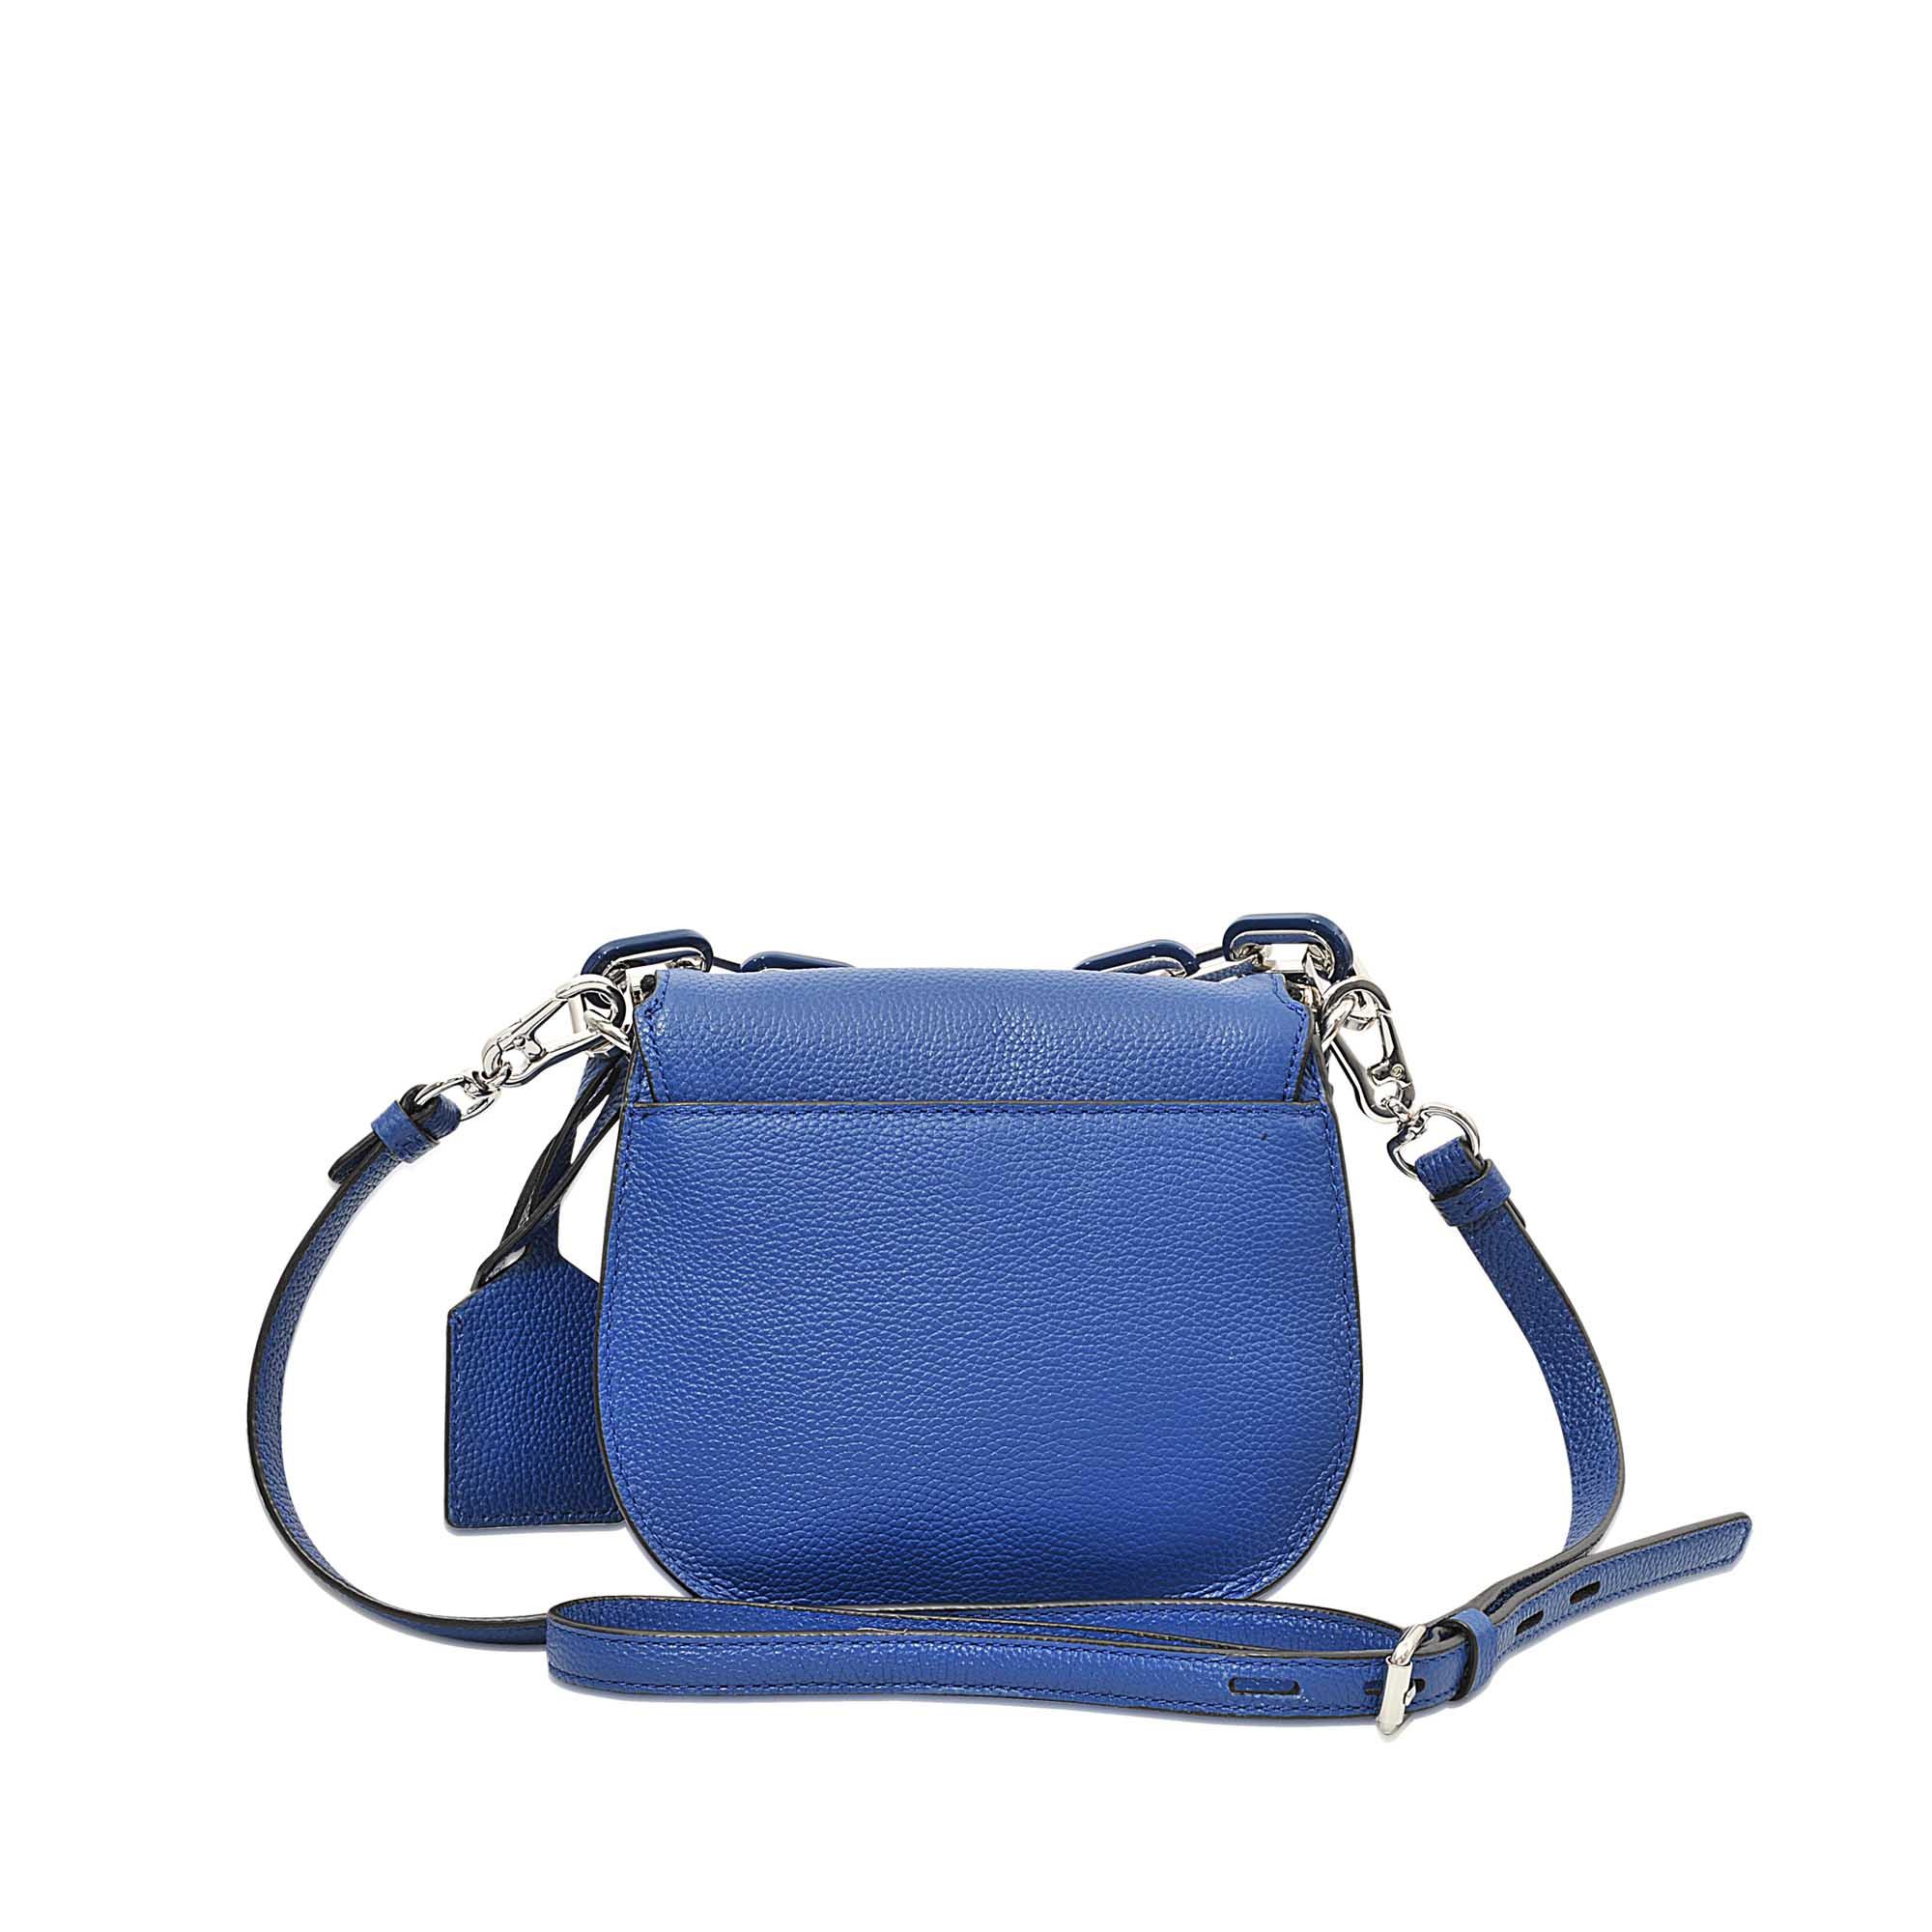 Karl lagerfeld K Grainy Small Satchel Bag in Blue | Lyst